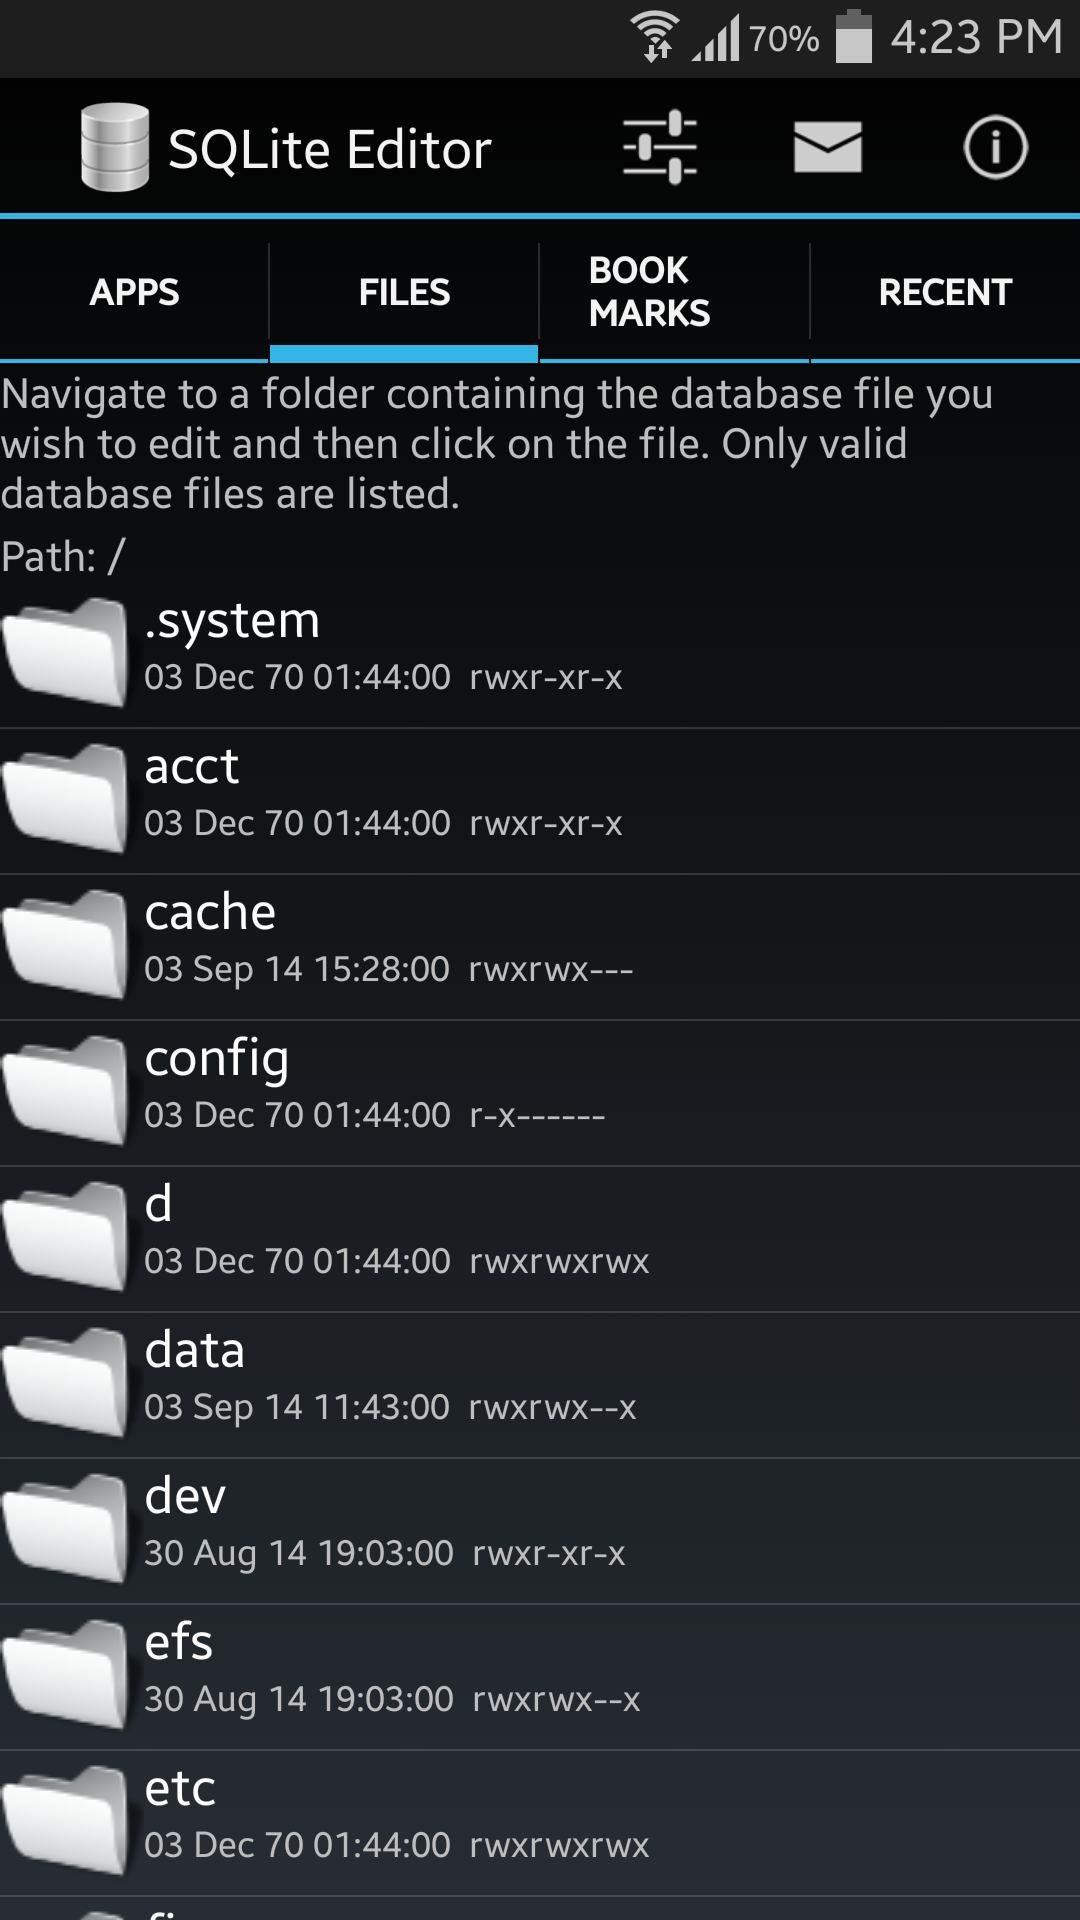 Pin on SQLite Editor